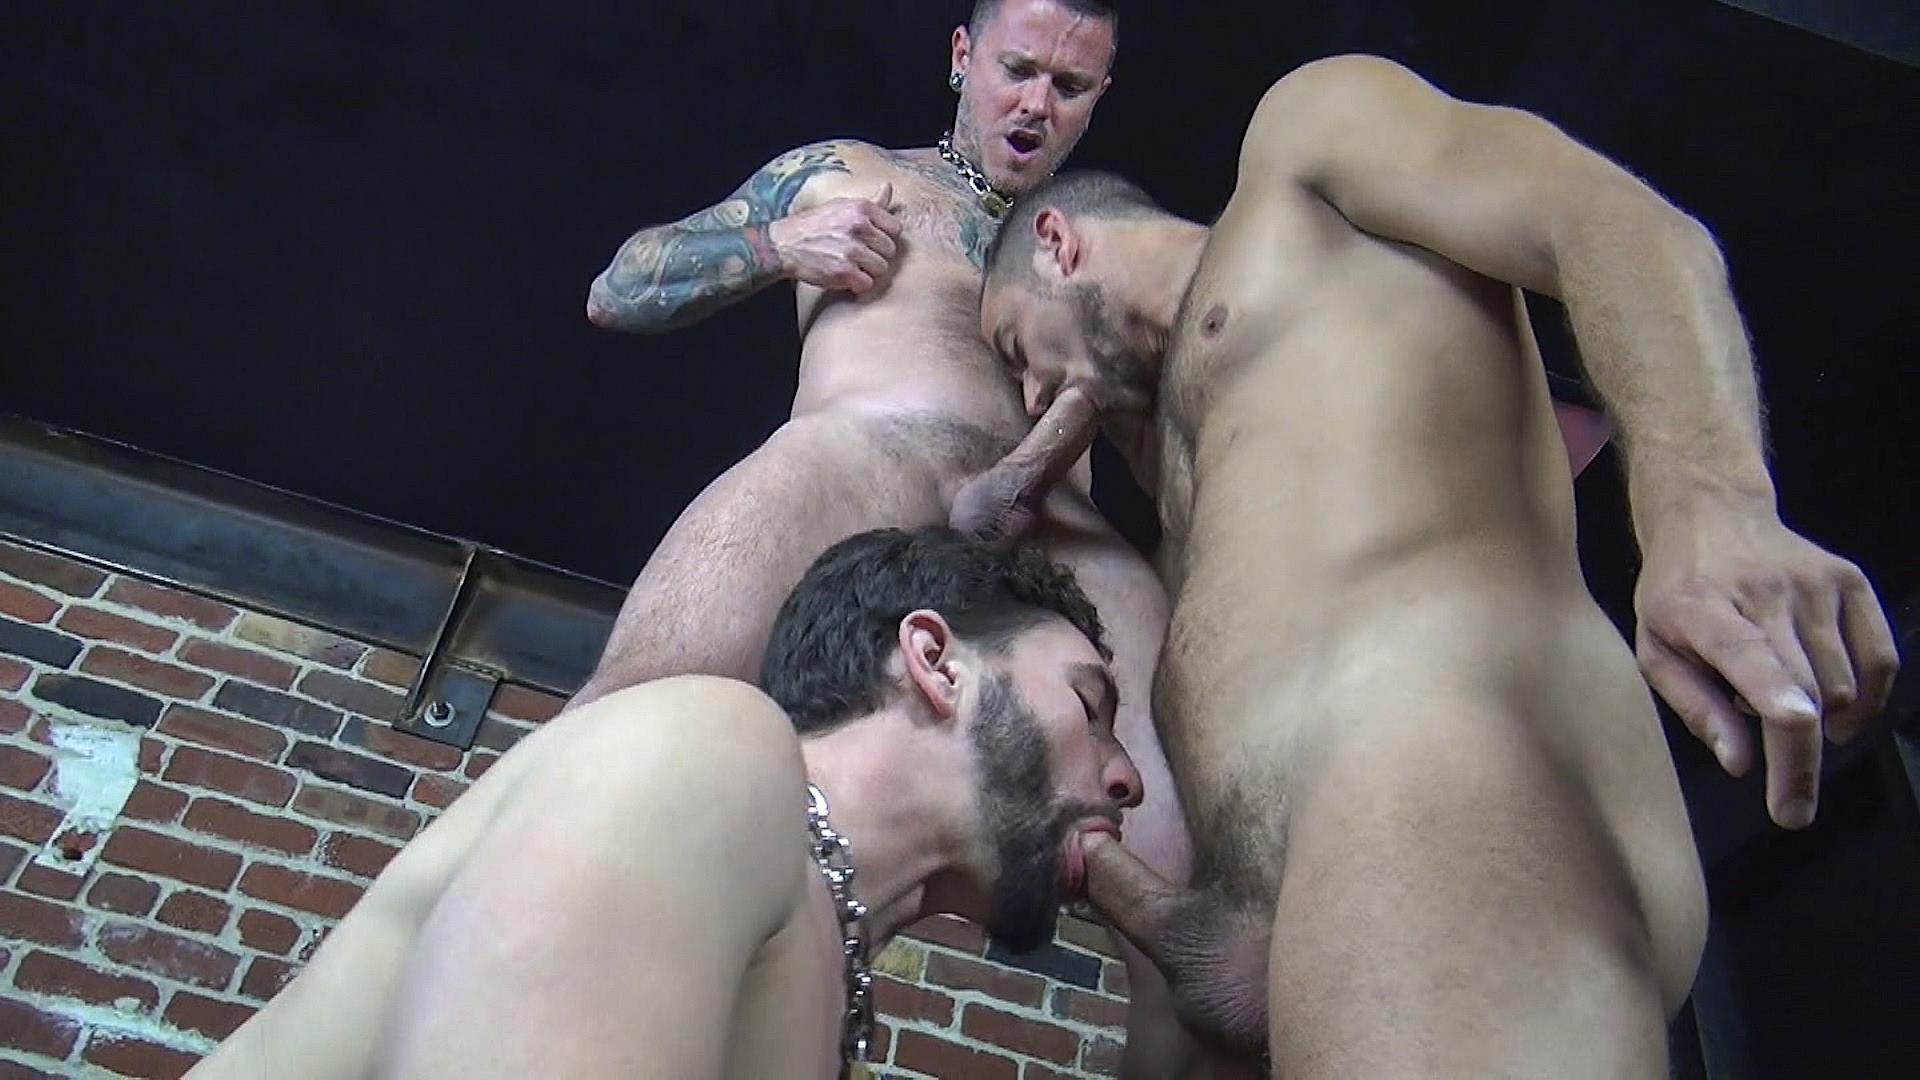 Raw-Fuck-Club-Max-Cameron-and-Jackson-Fillmore-and-Leon-Fox-Bareback-Double-Penetration-Amateur-Gay-Porn-10 Getting Double Penetrated Bareback By A Big Uncut Cock